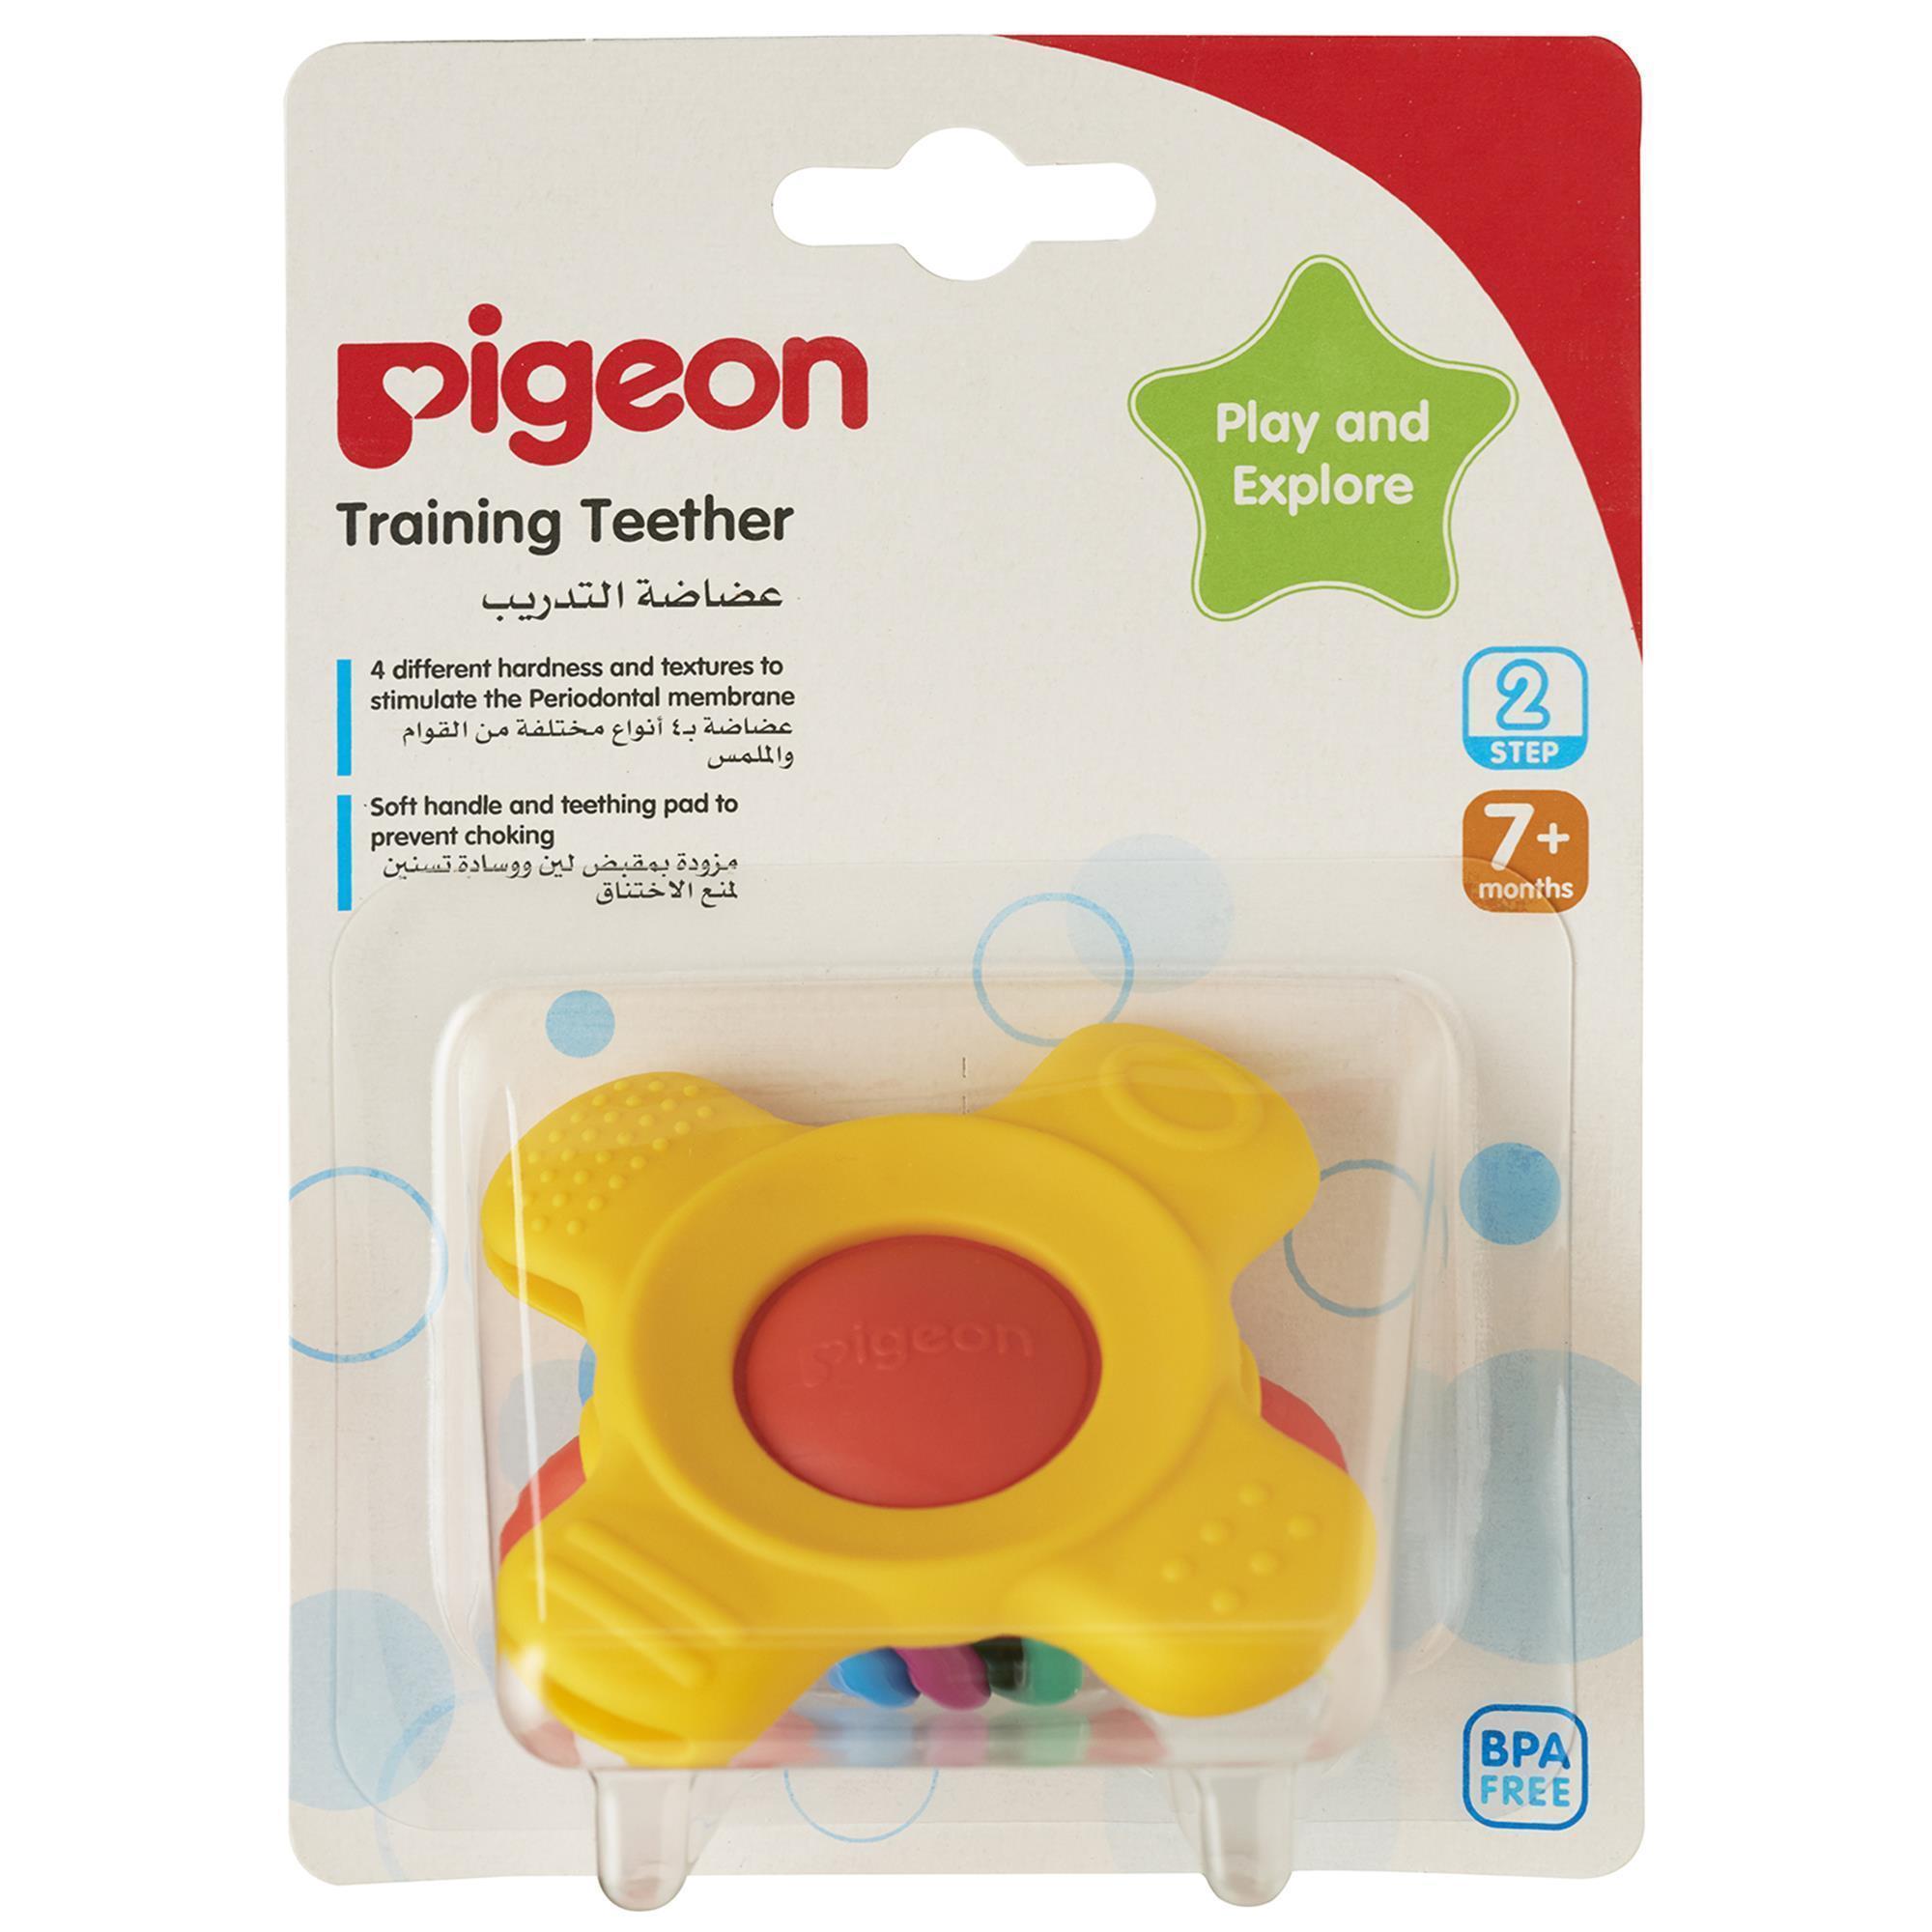 PIGEON TEETHER STEP 2 GIGITAN BAYI